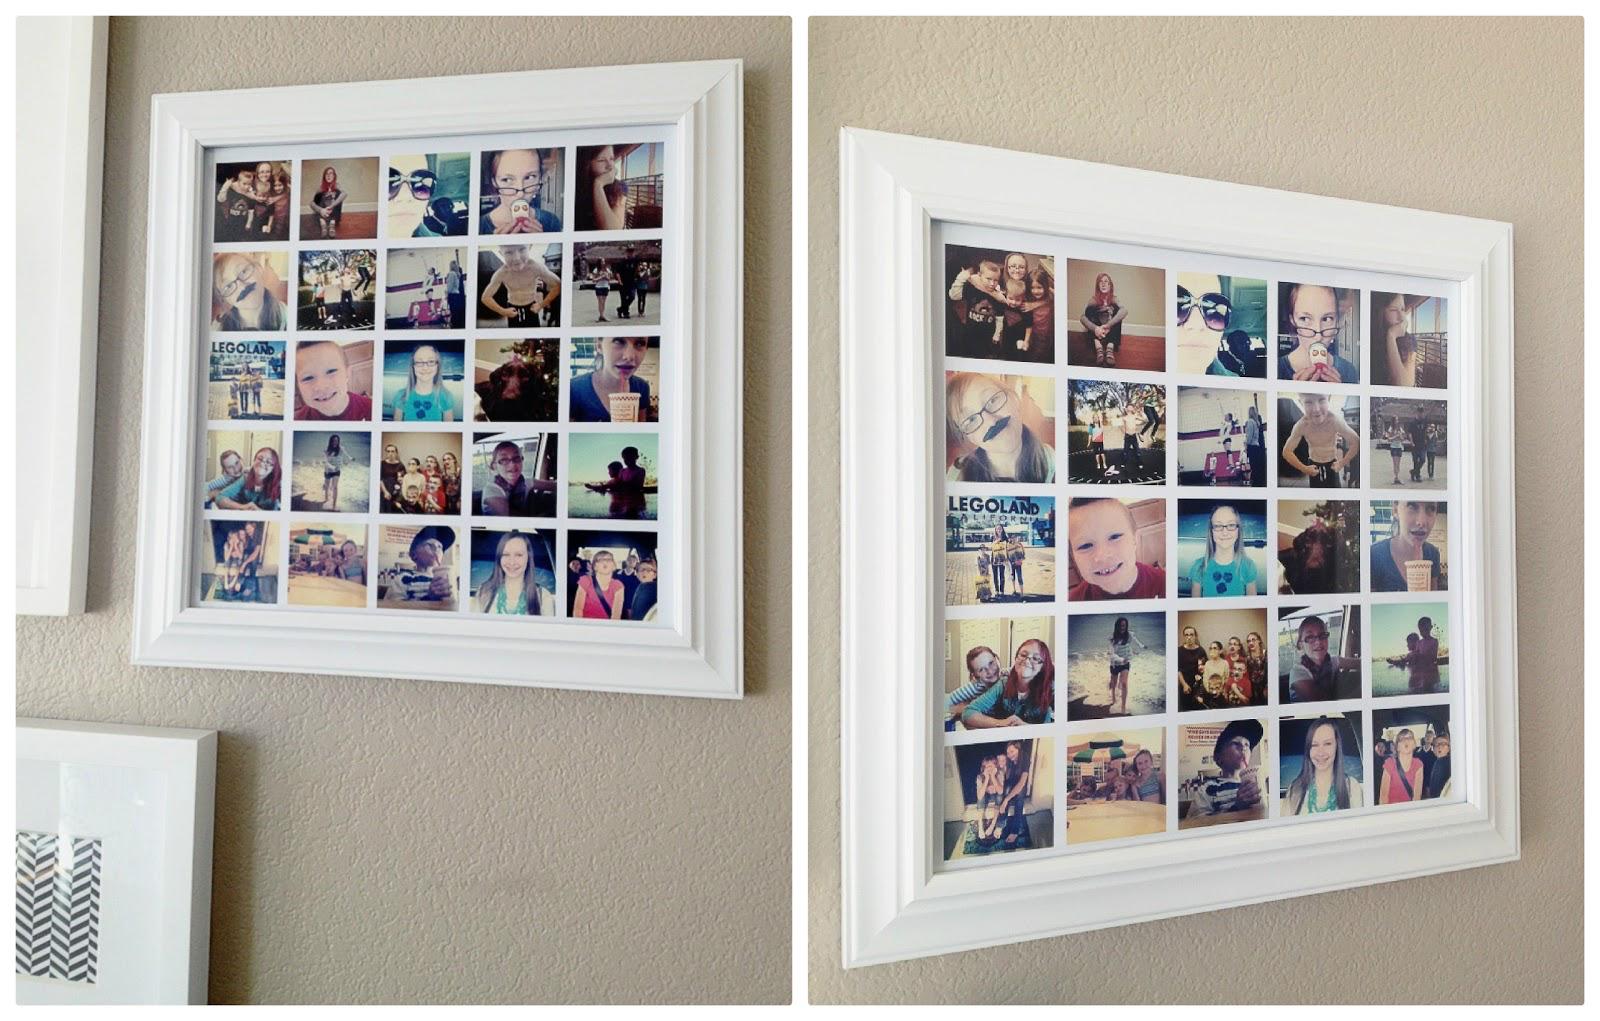 Framing your instagram images